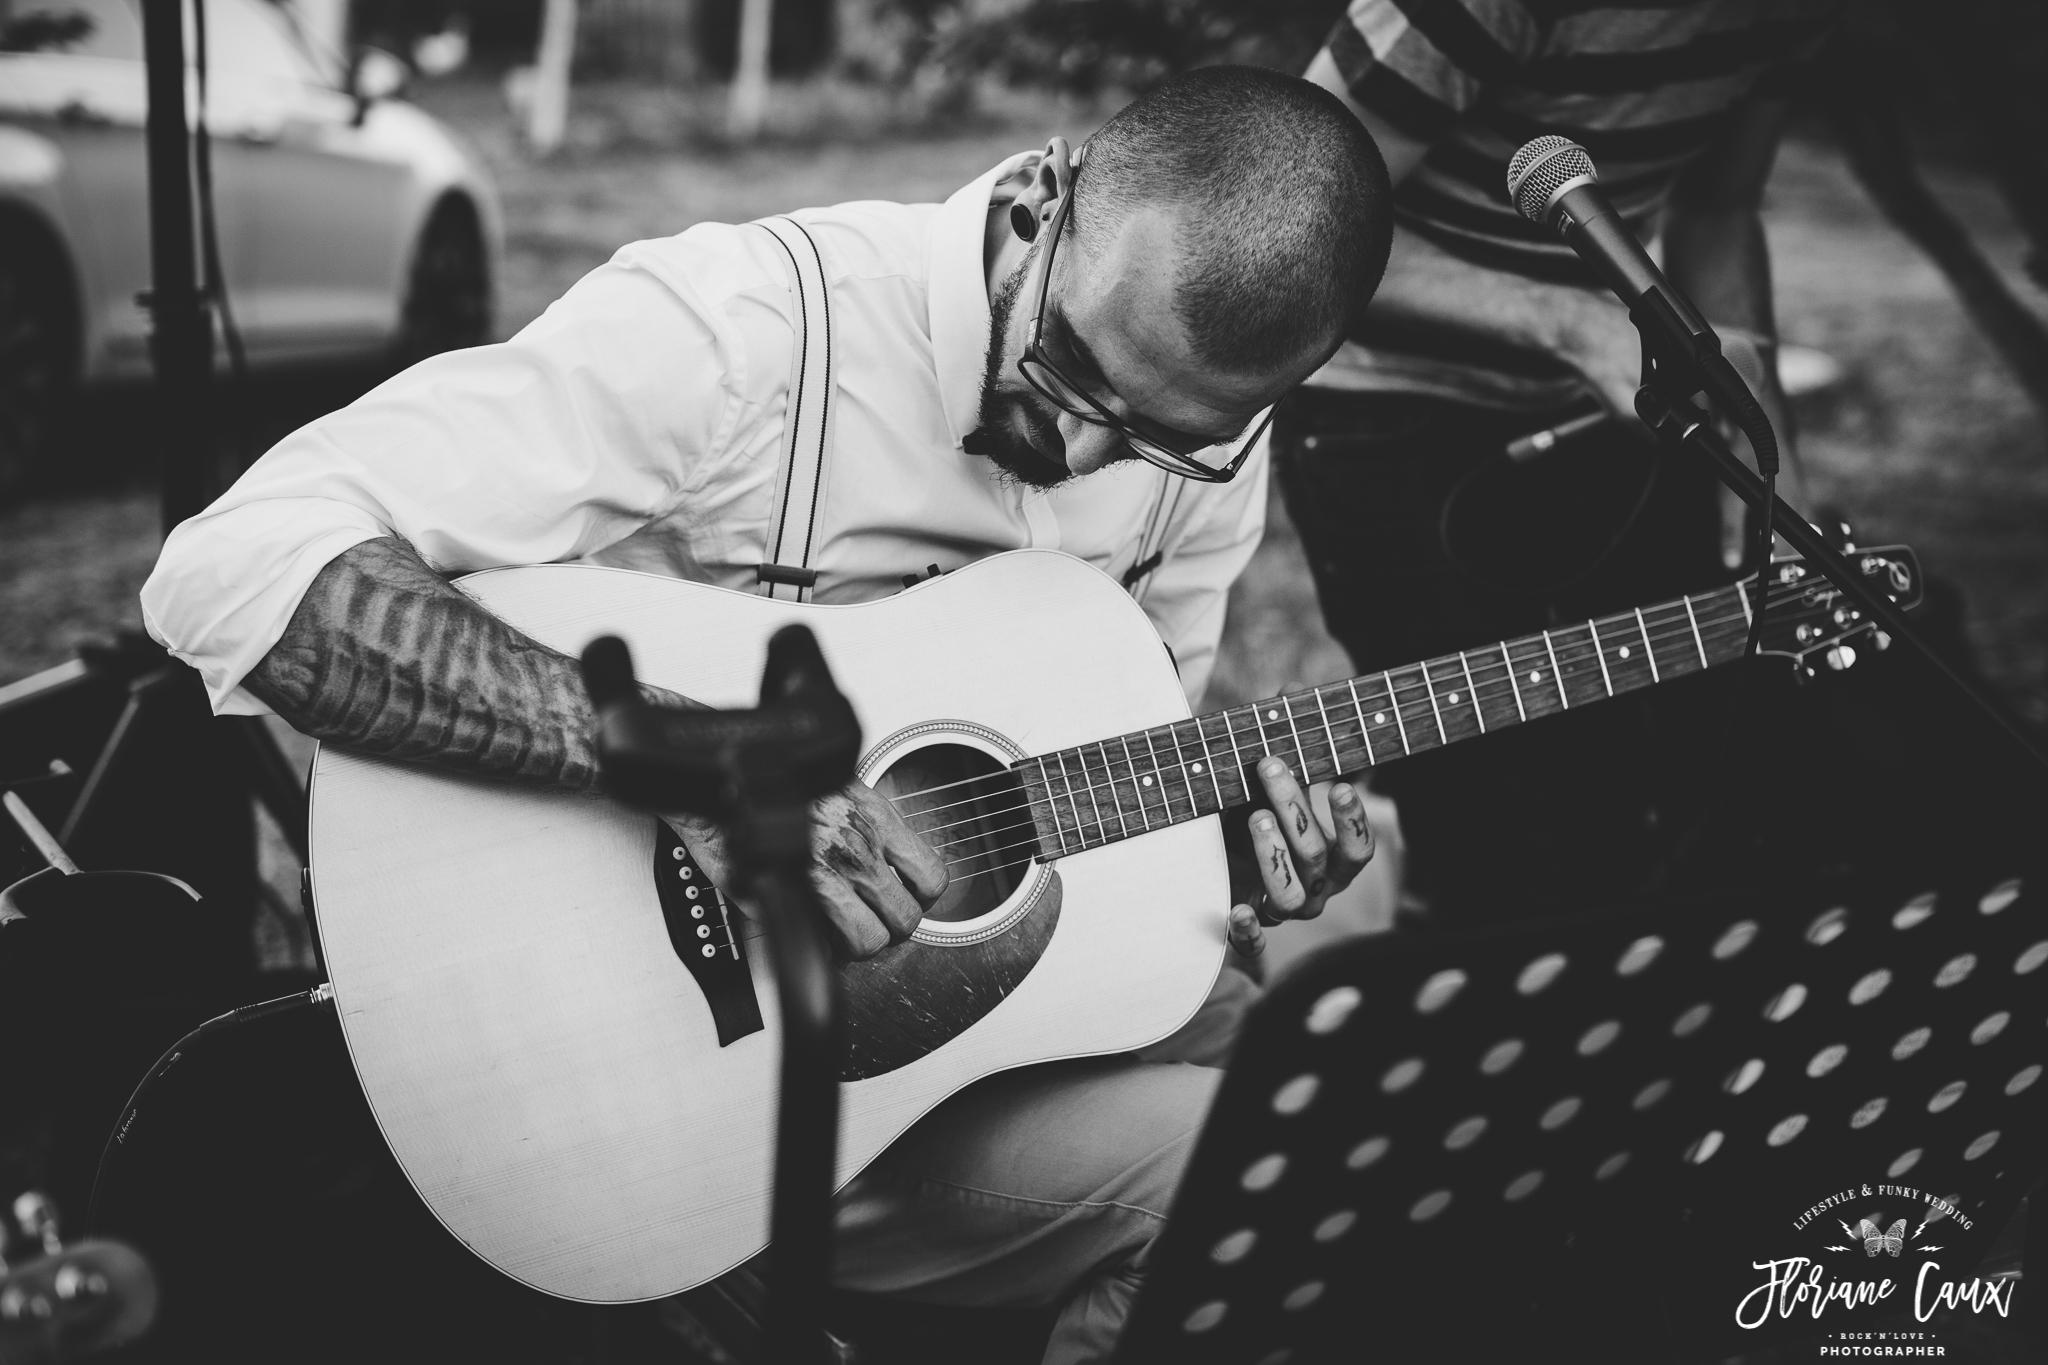 photographe-mariage-toulouse-rocknroll-maries-tatoues-floriane-caux-94